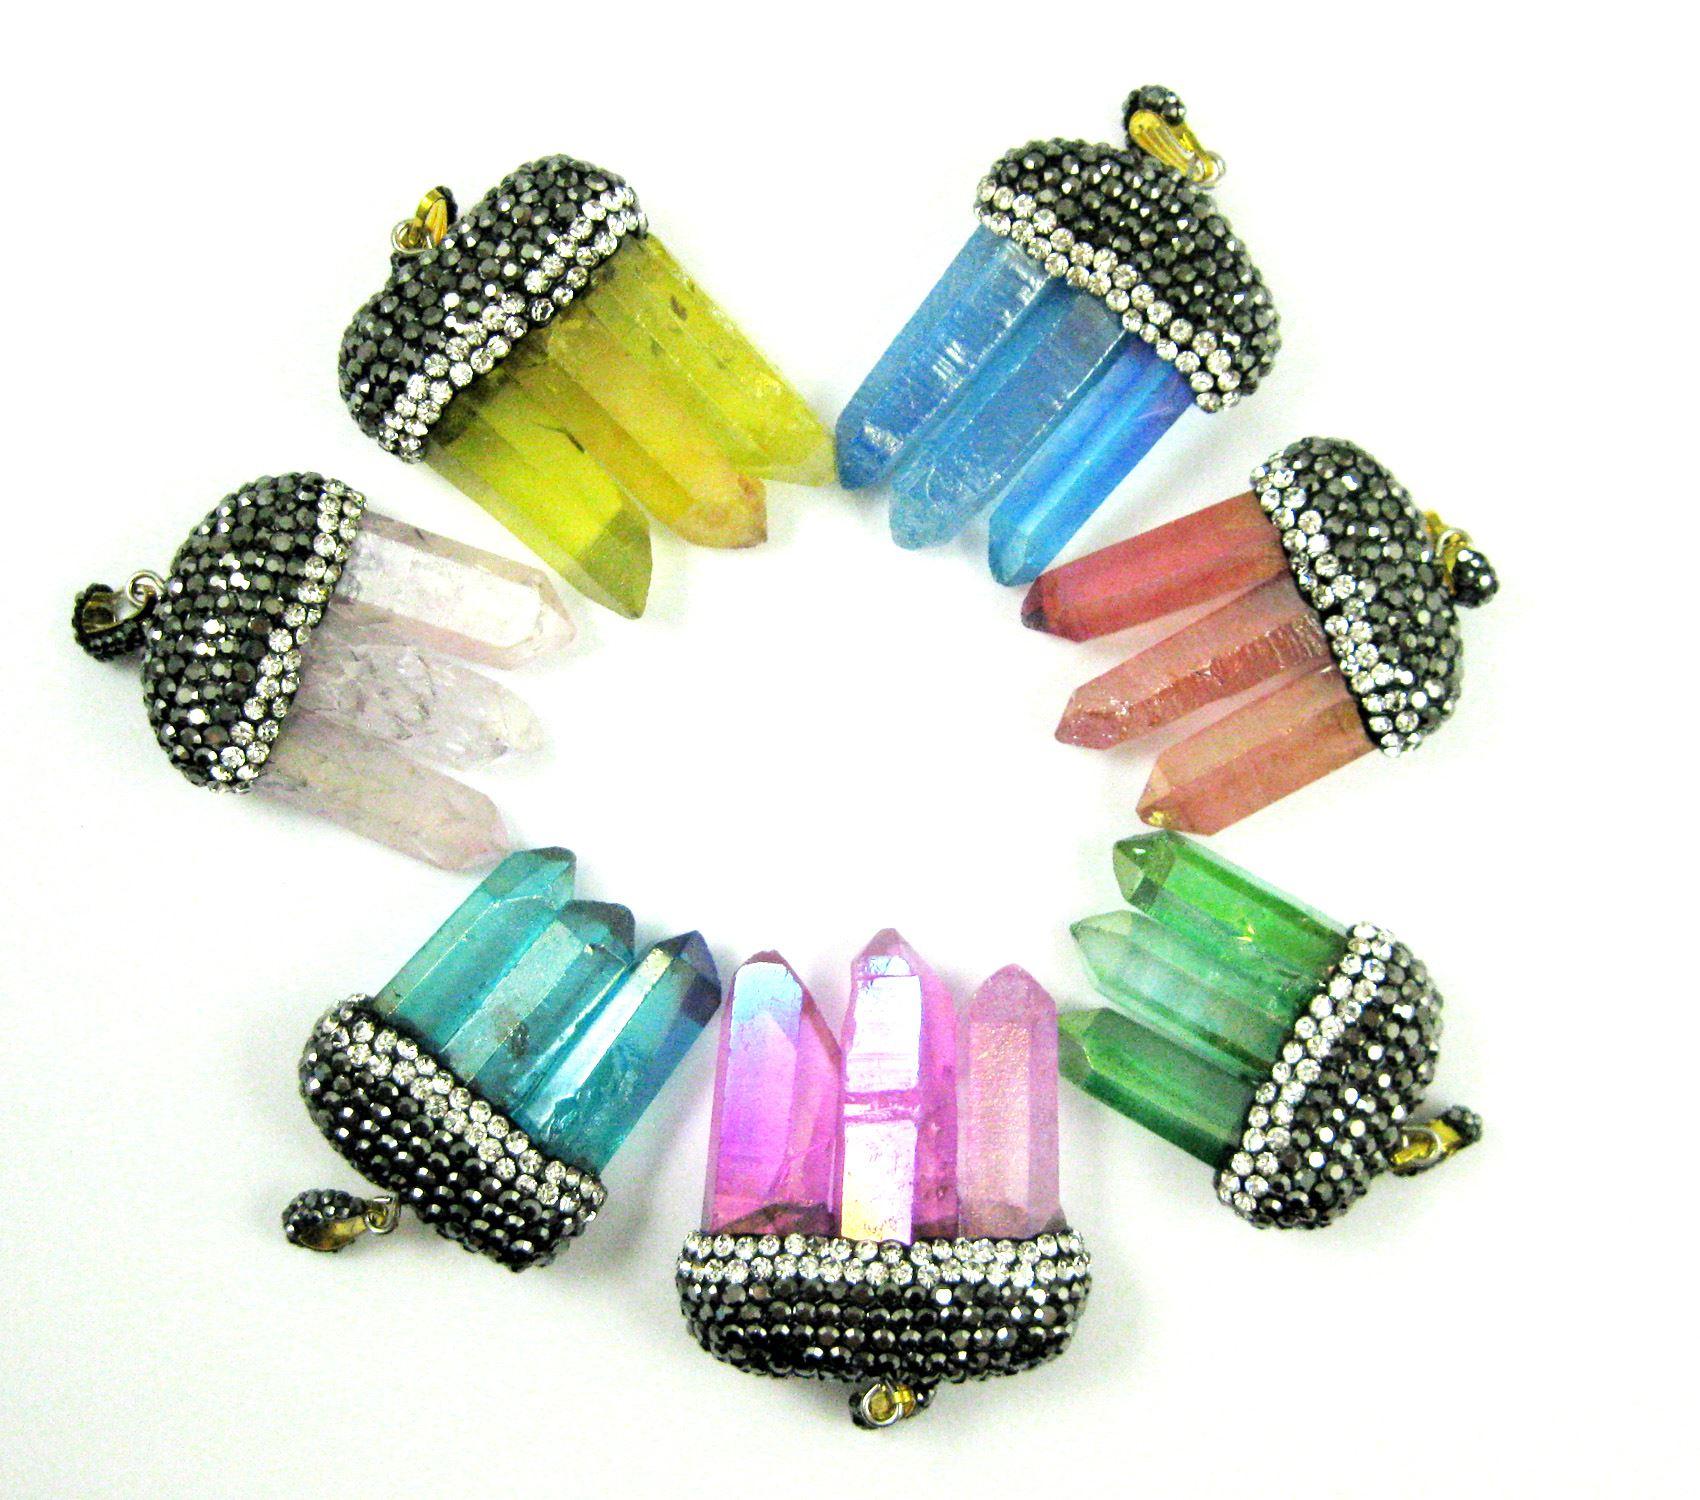 Natural Aura Quartz Tri Crystal Pave Pendant - Tri Pendulum Spike Pendant - Pink Crystal- 45mm